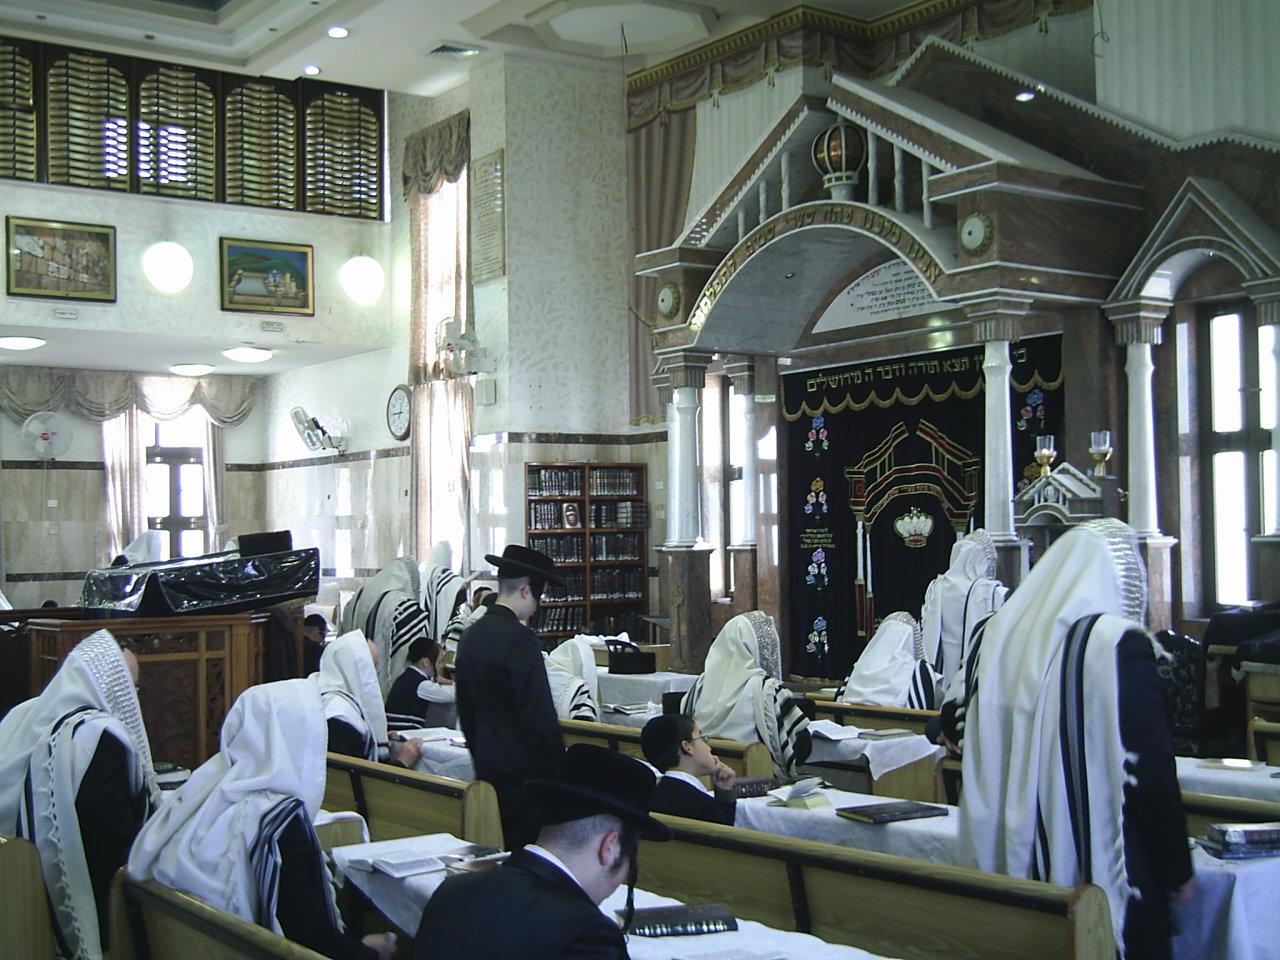 ortodossi ebrei regole di dating